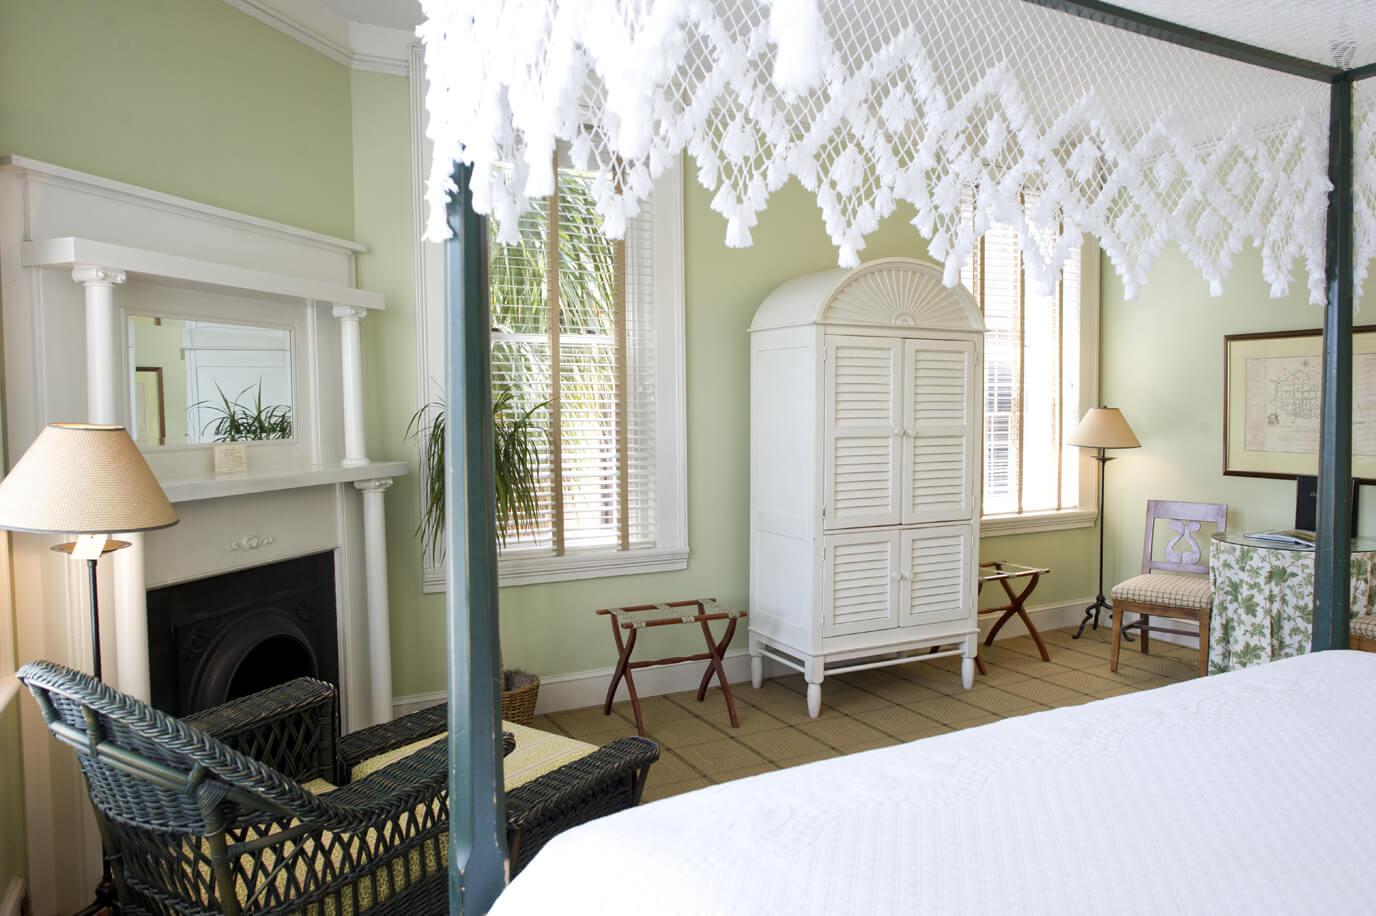 Typical Charleston hotels